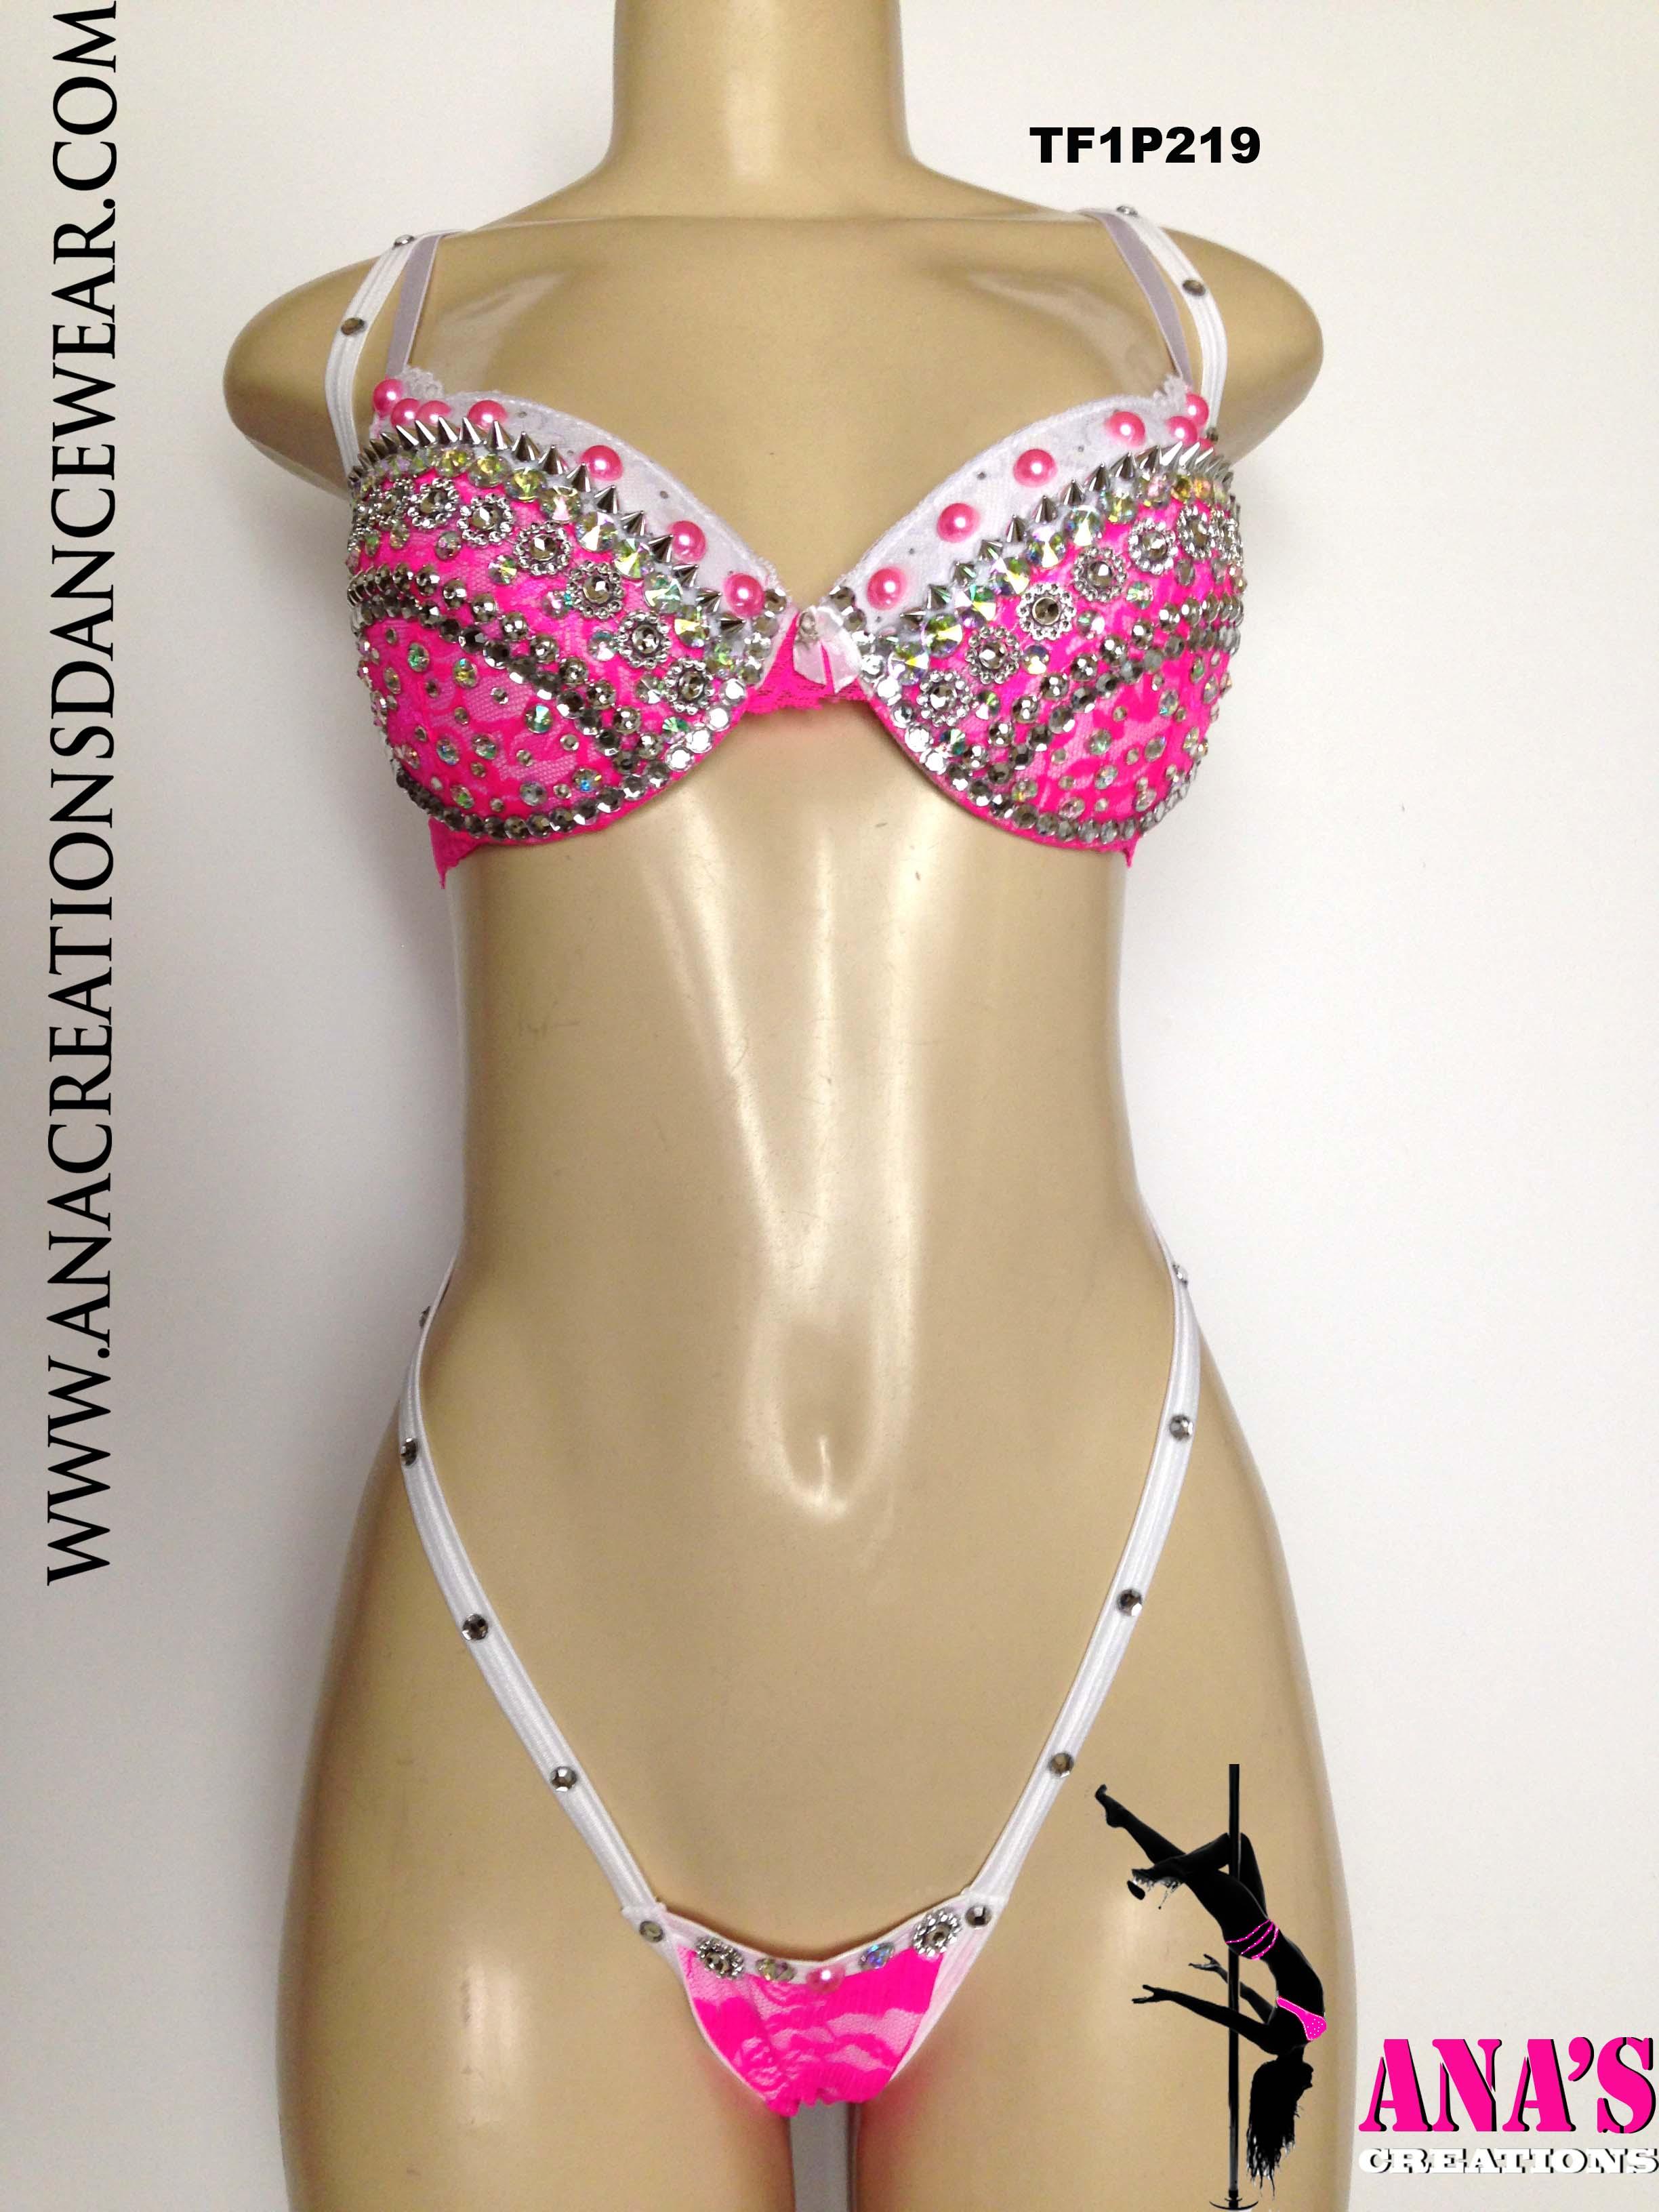 a813f4c4f2a Ana s Creations Exotic Dancewear